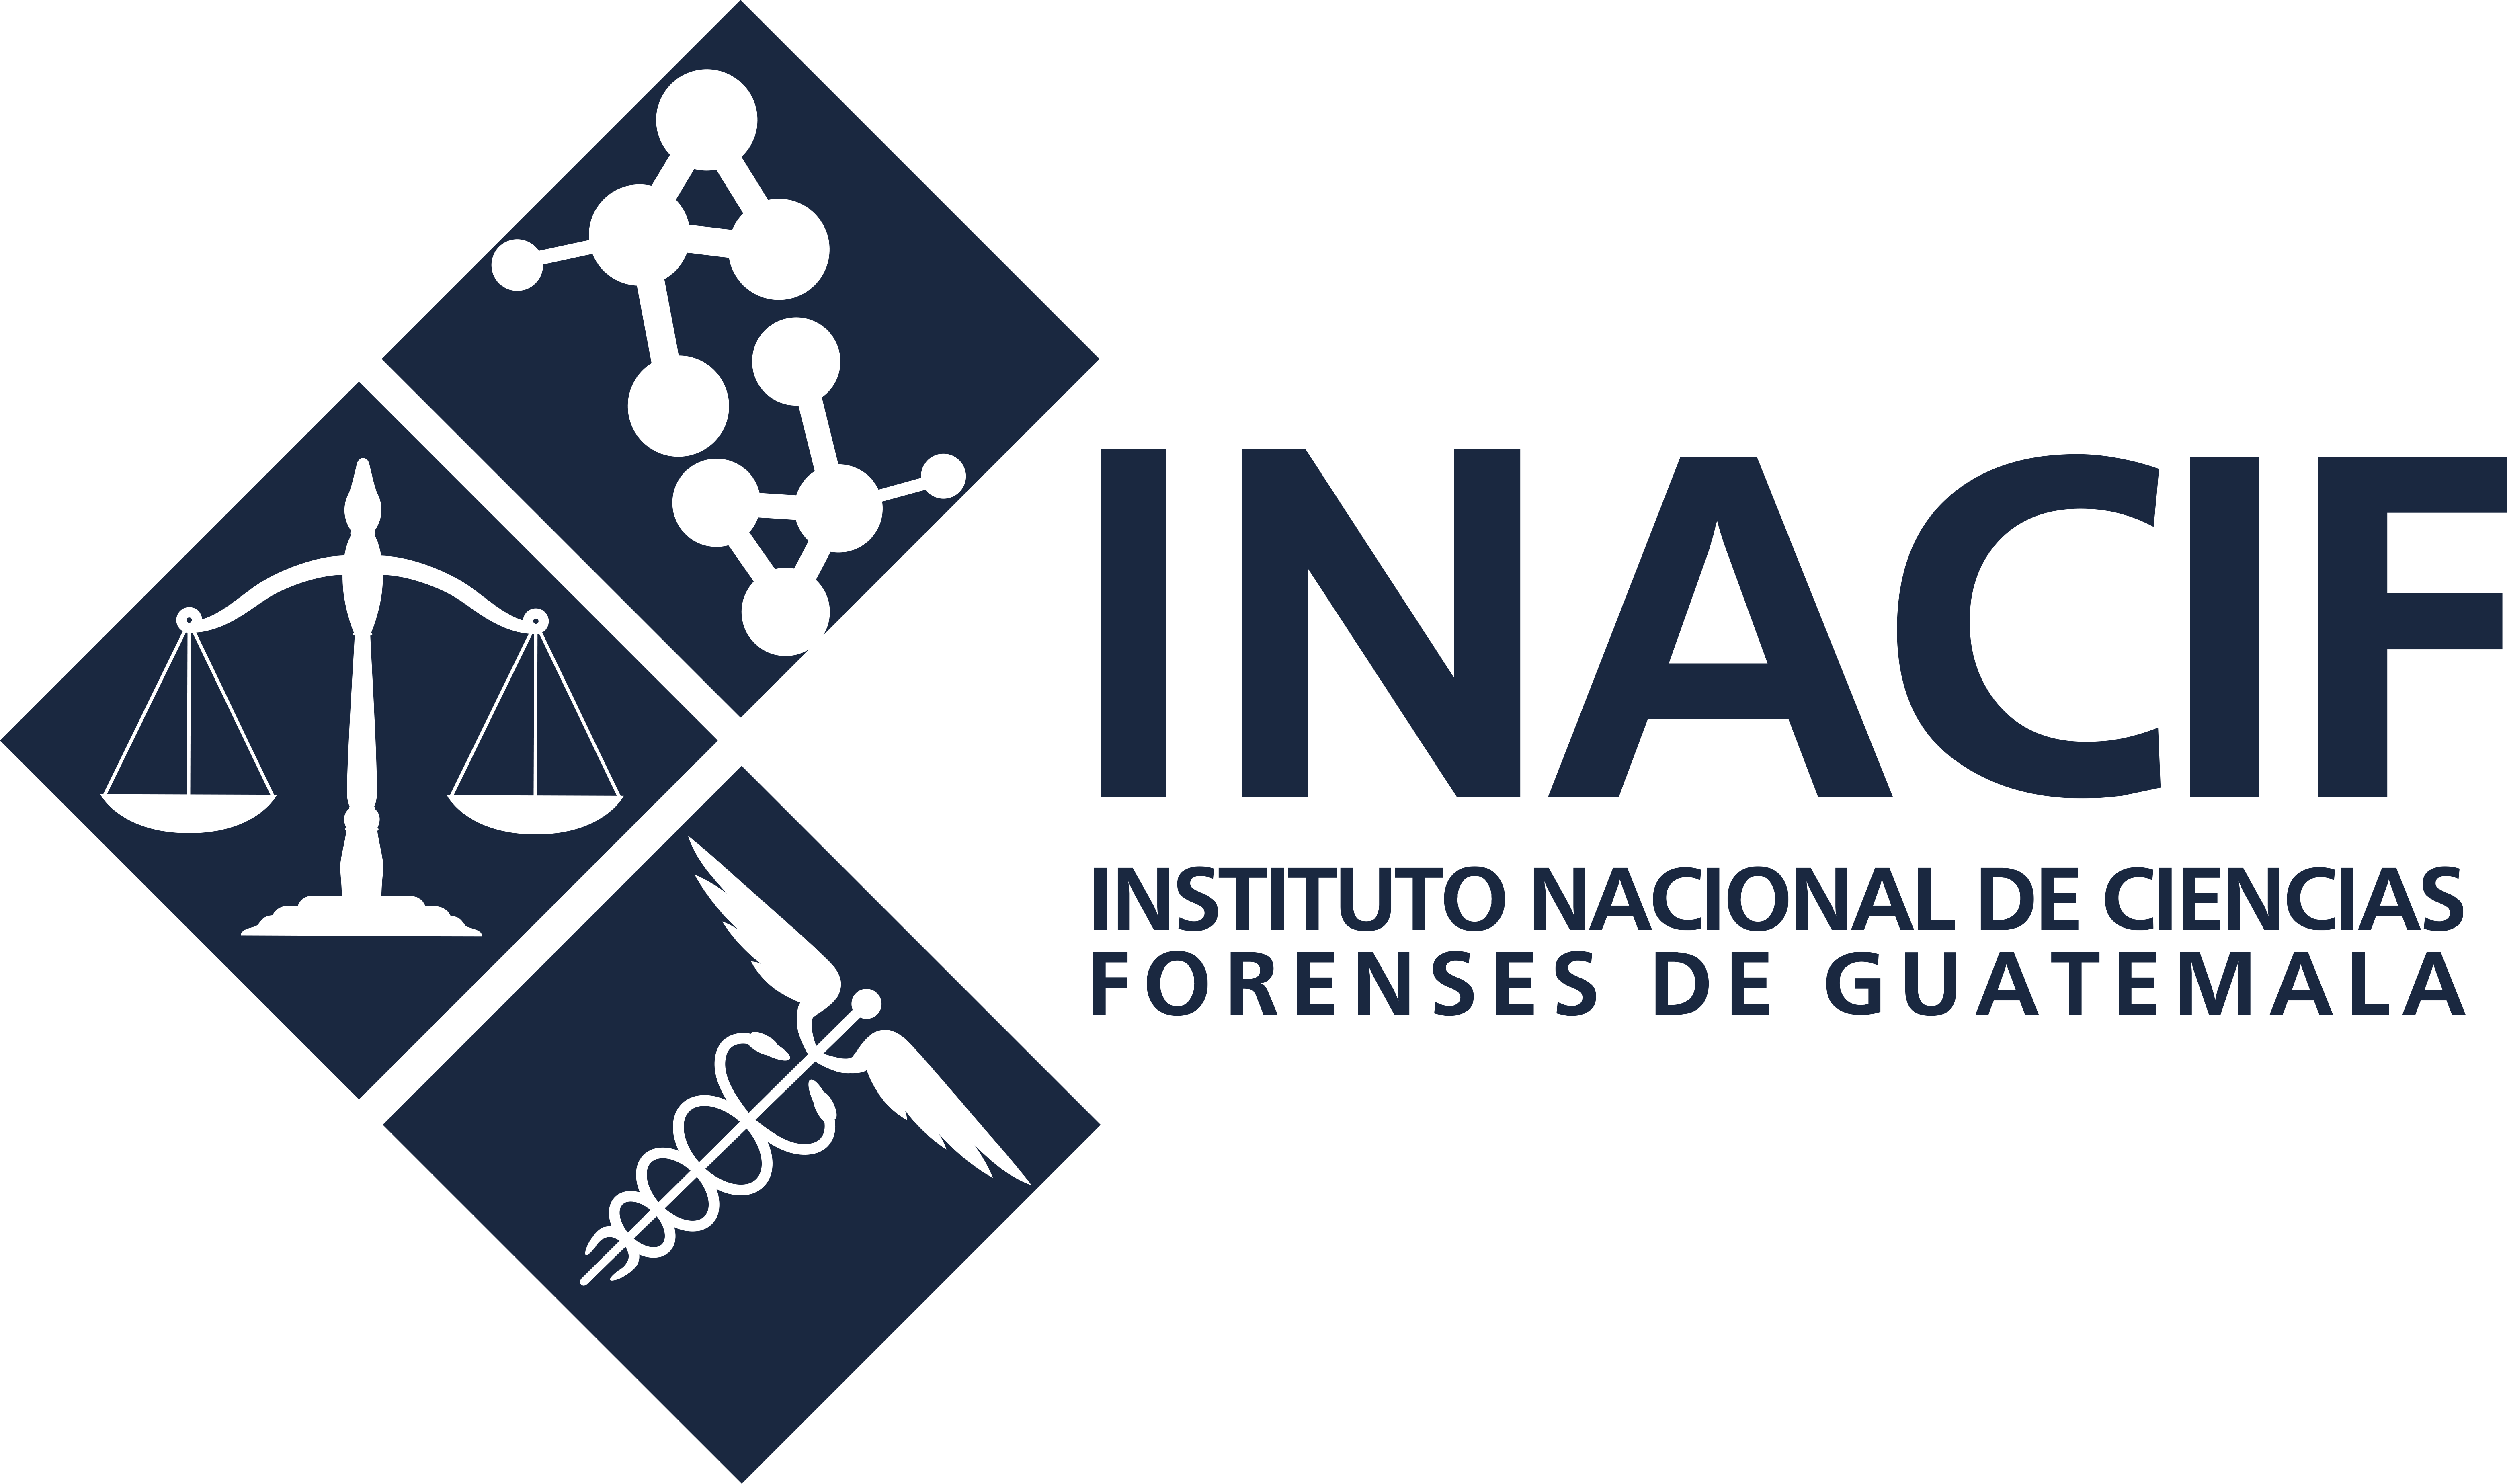 Instituto Nacional de Ciencias Forenses de Guatemala